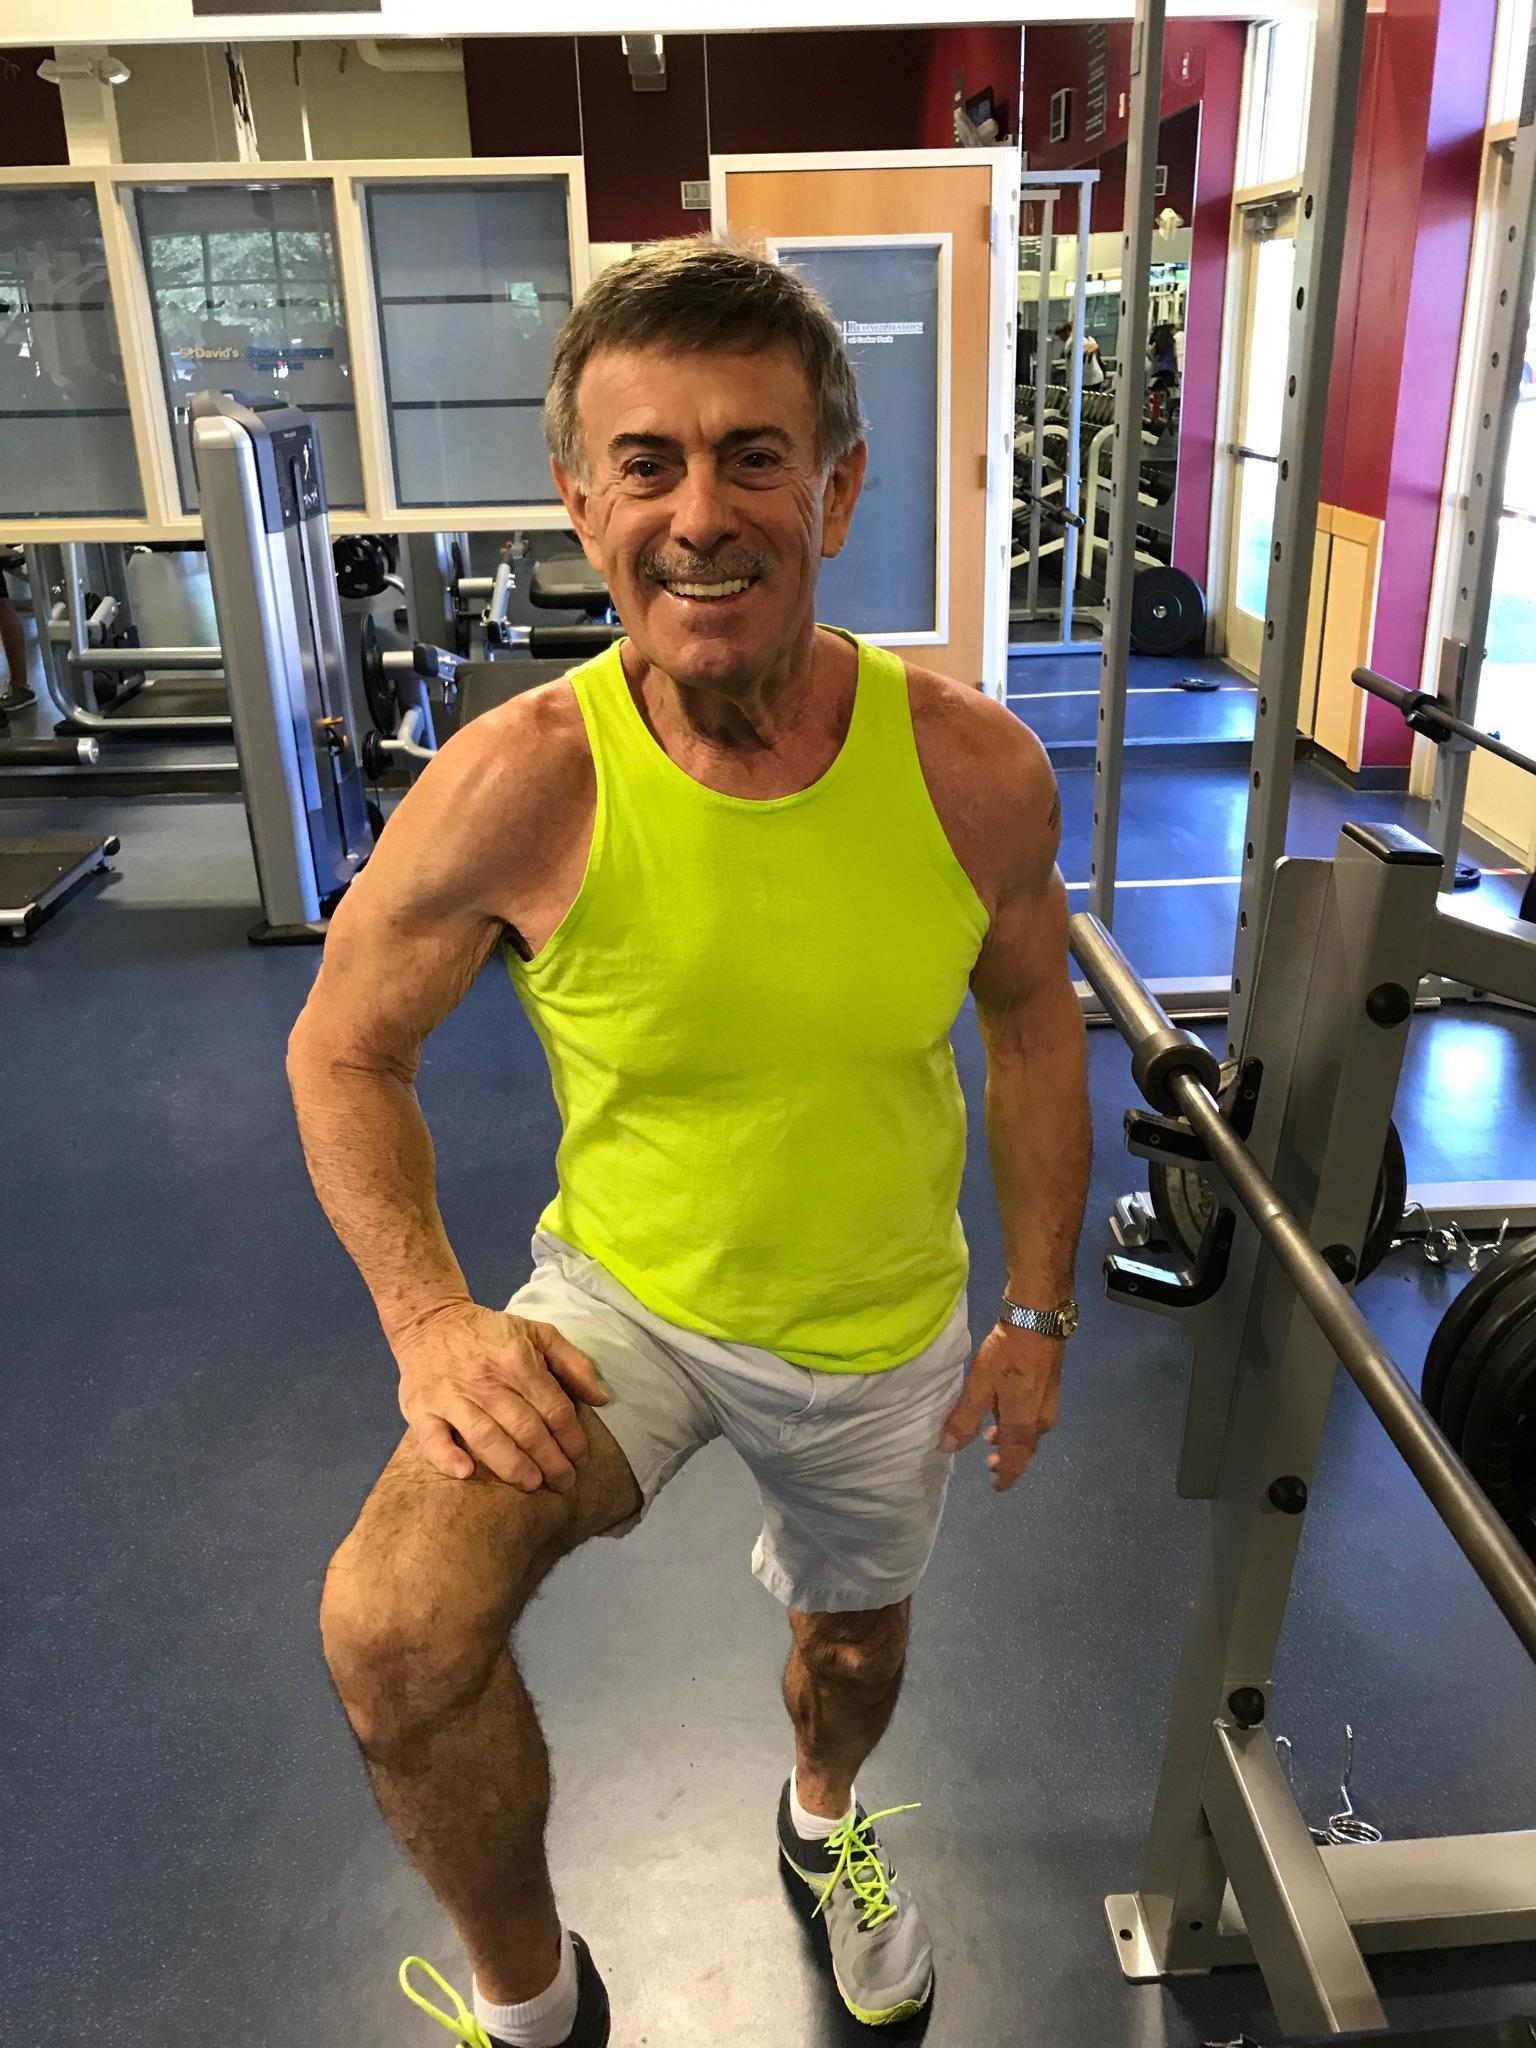 Ralph.Fitness